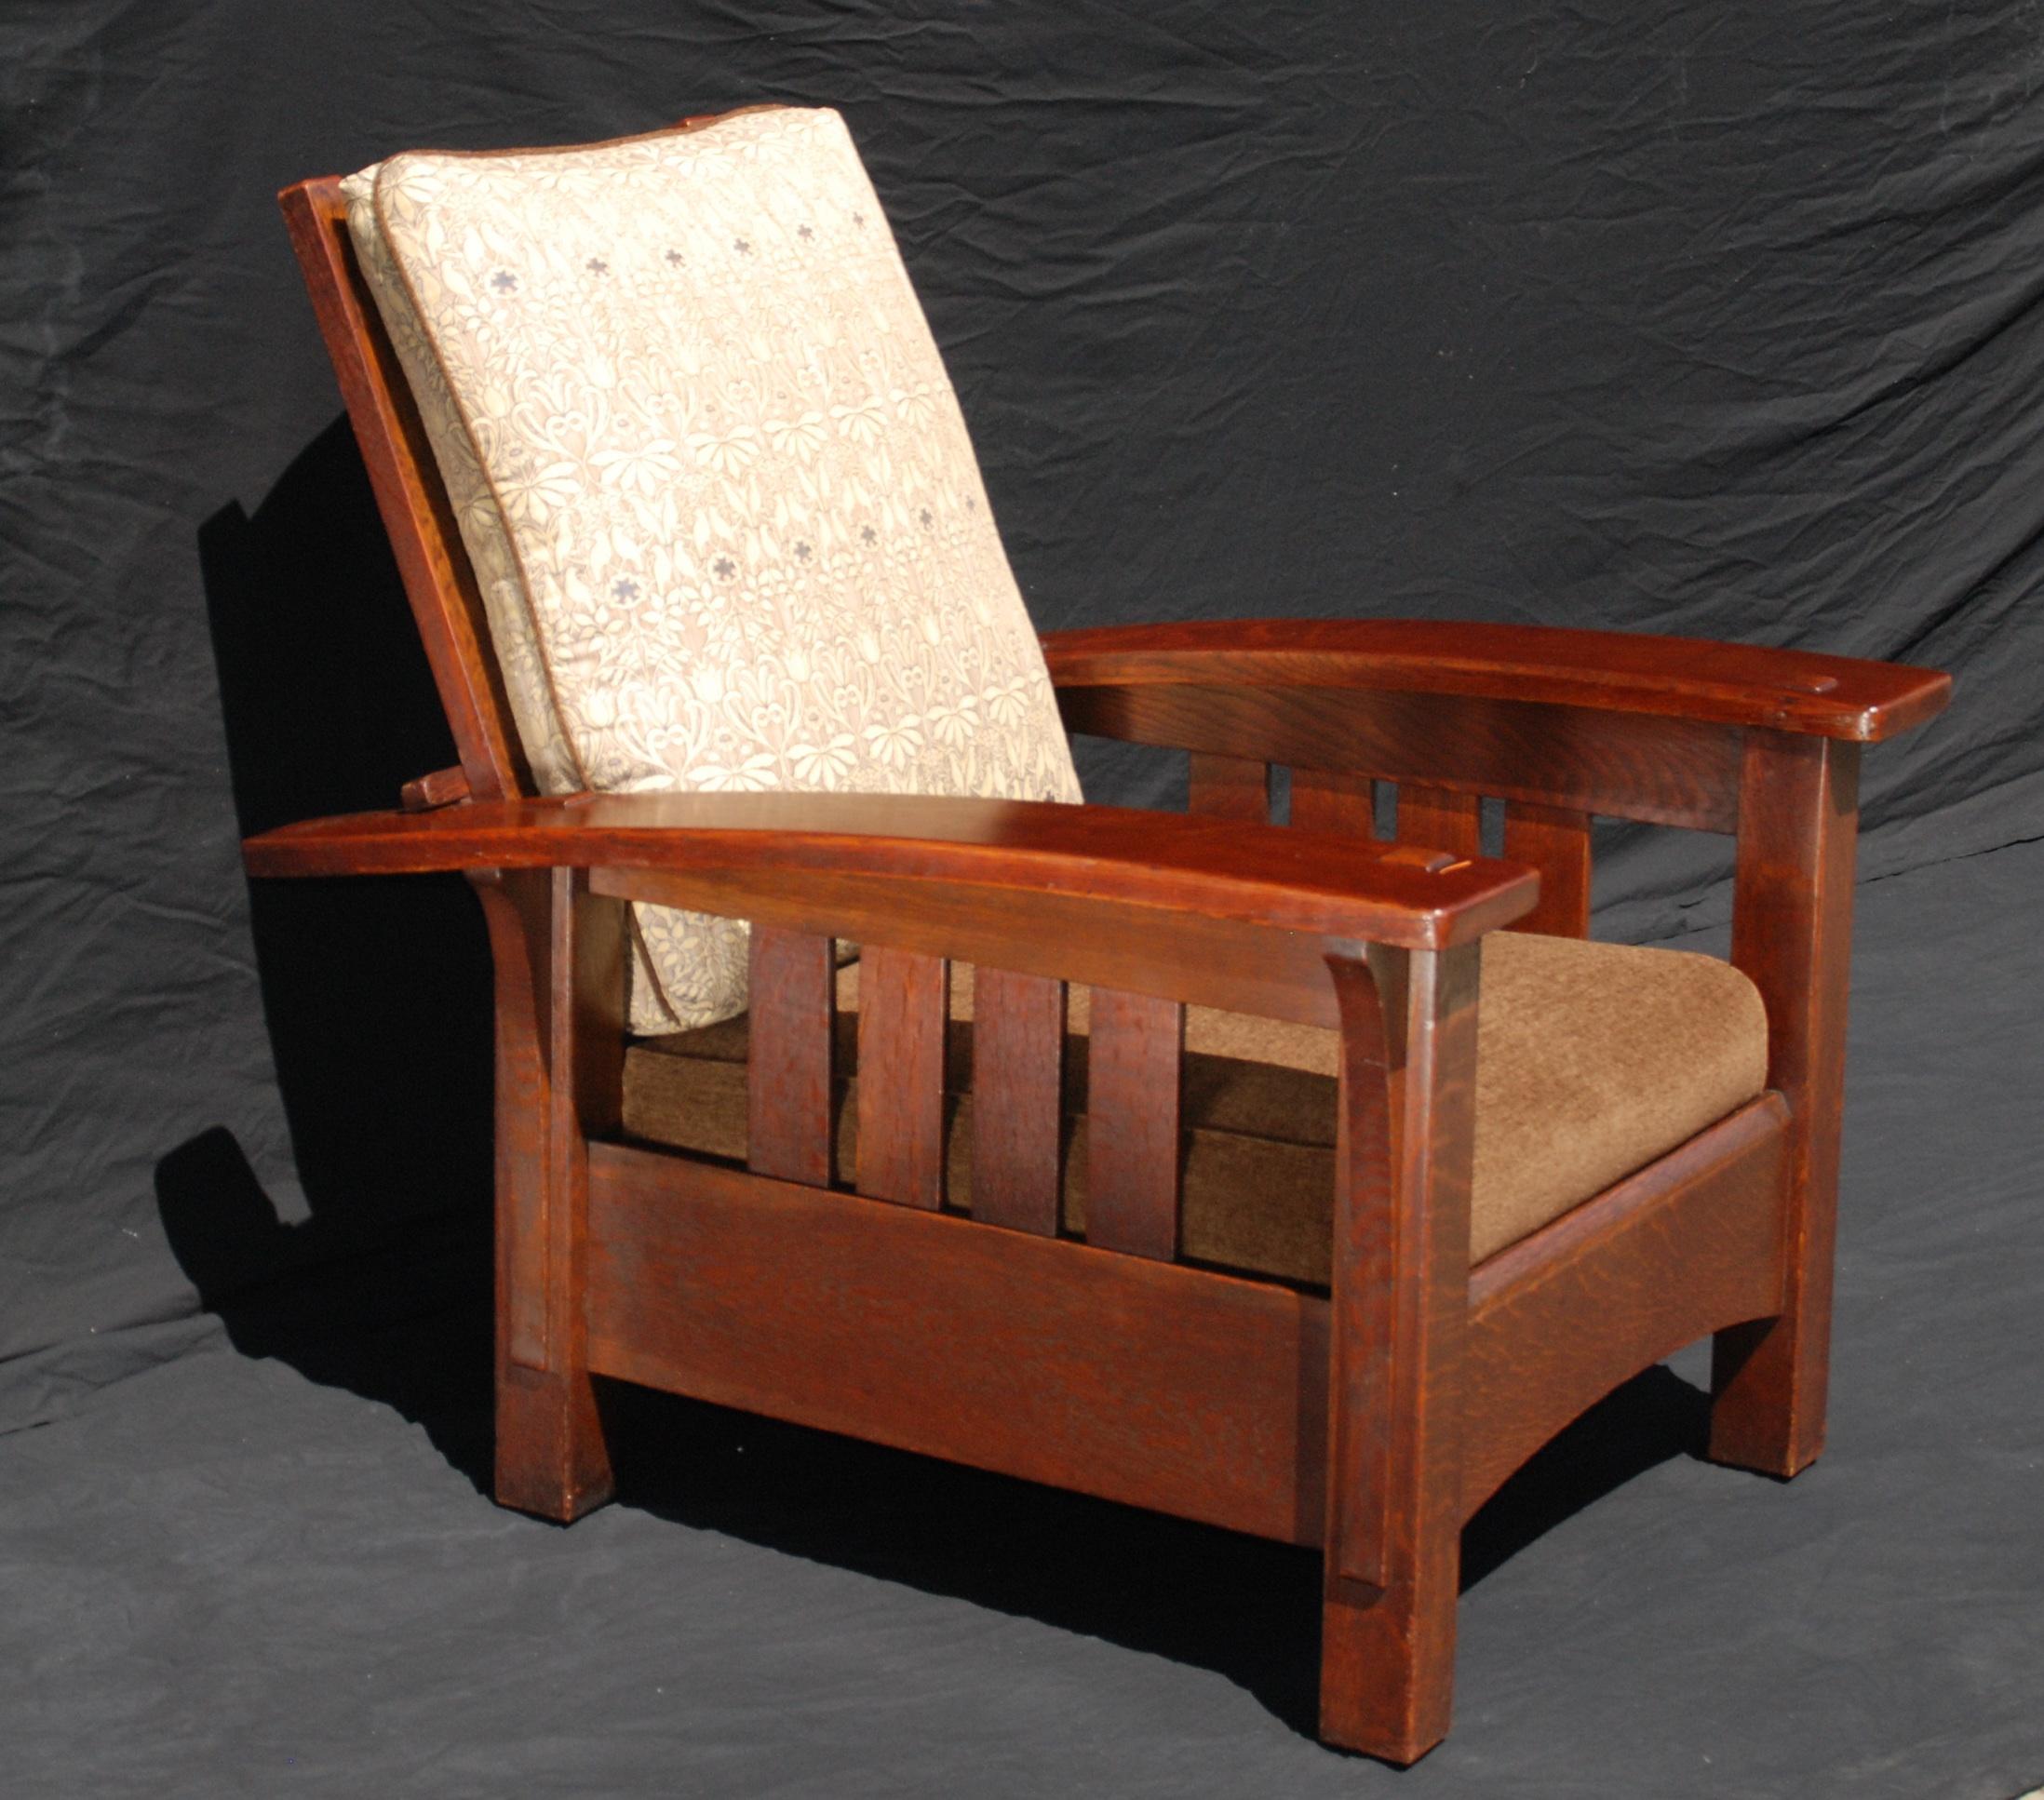 Antique stickley morris chair - Antique Stickley Morris Chair 13